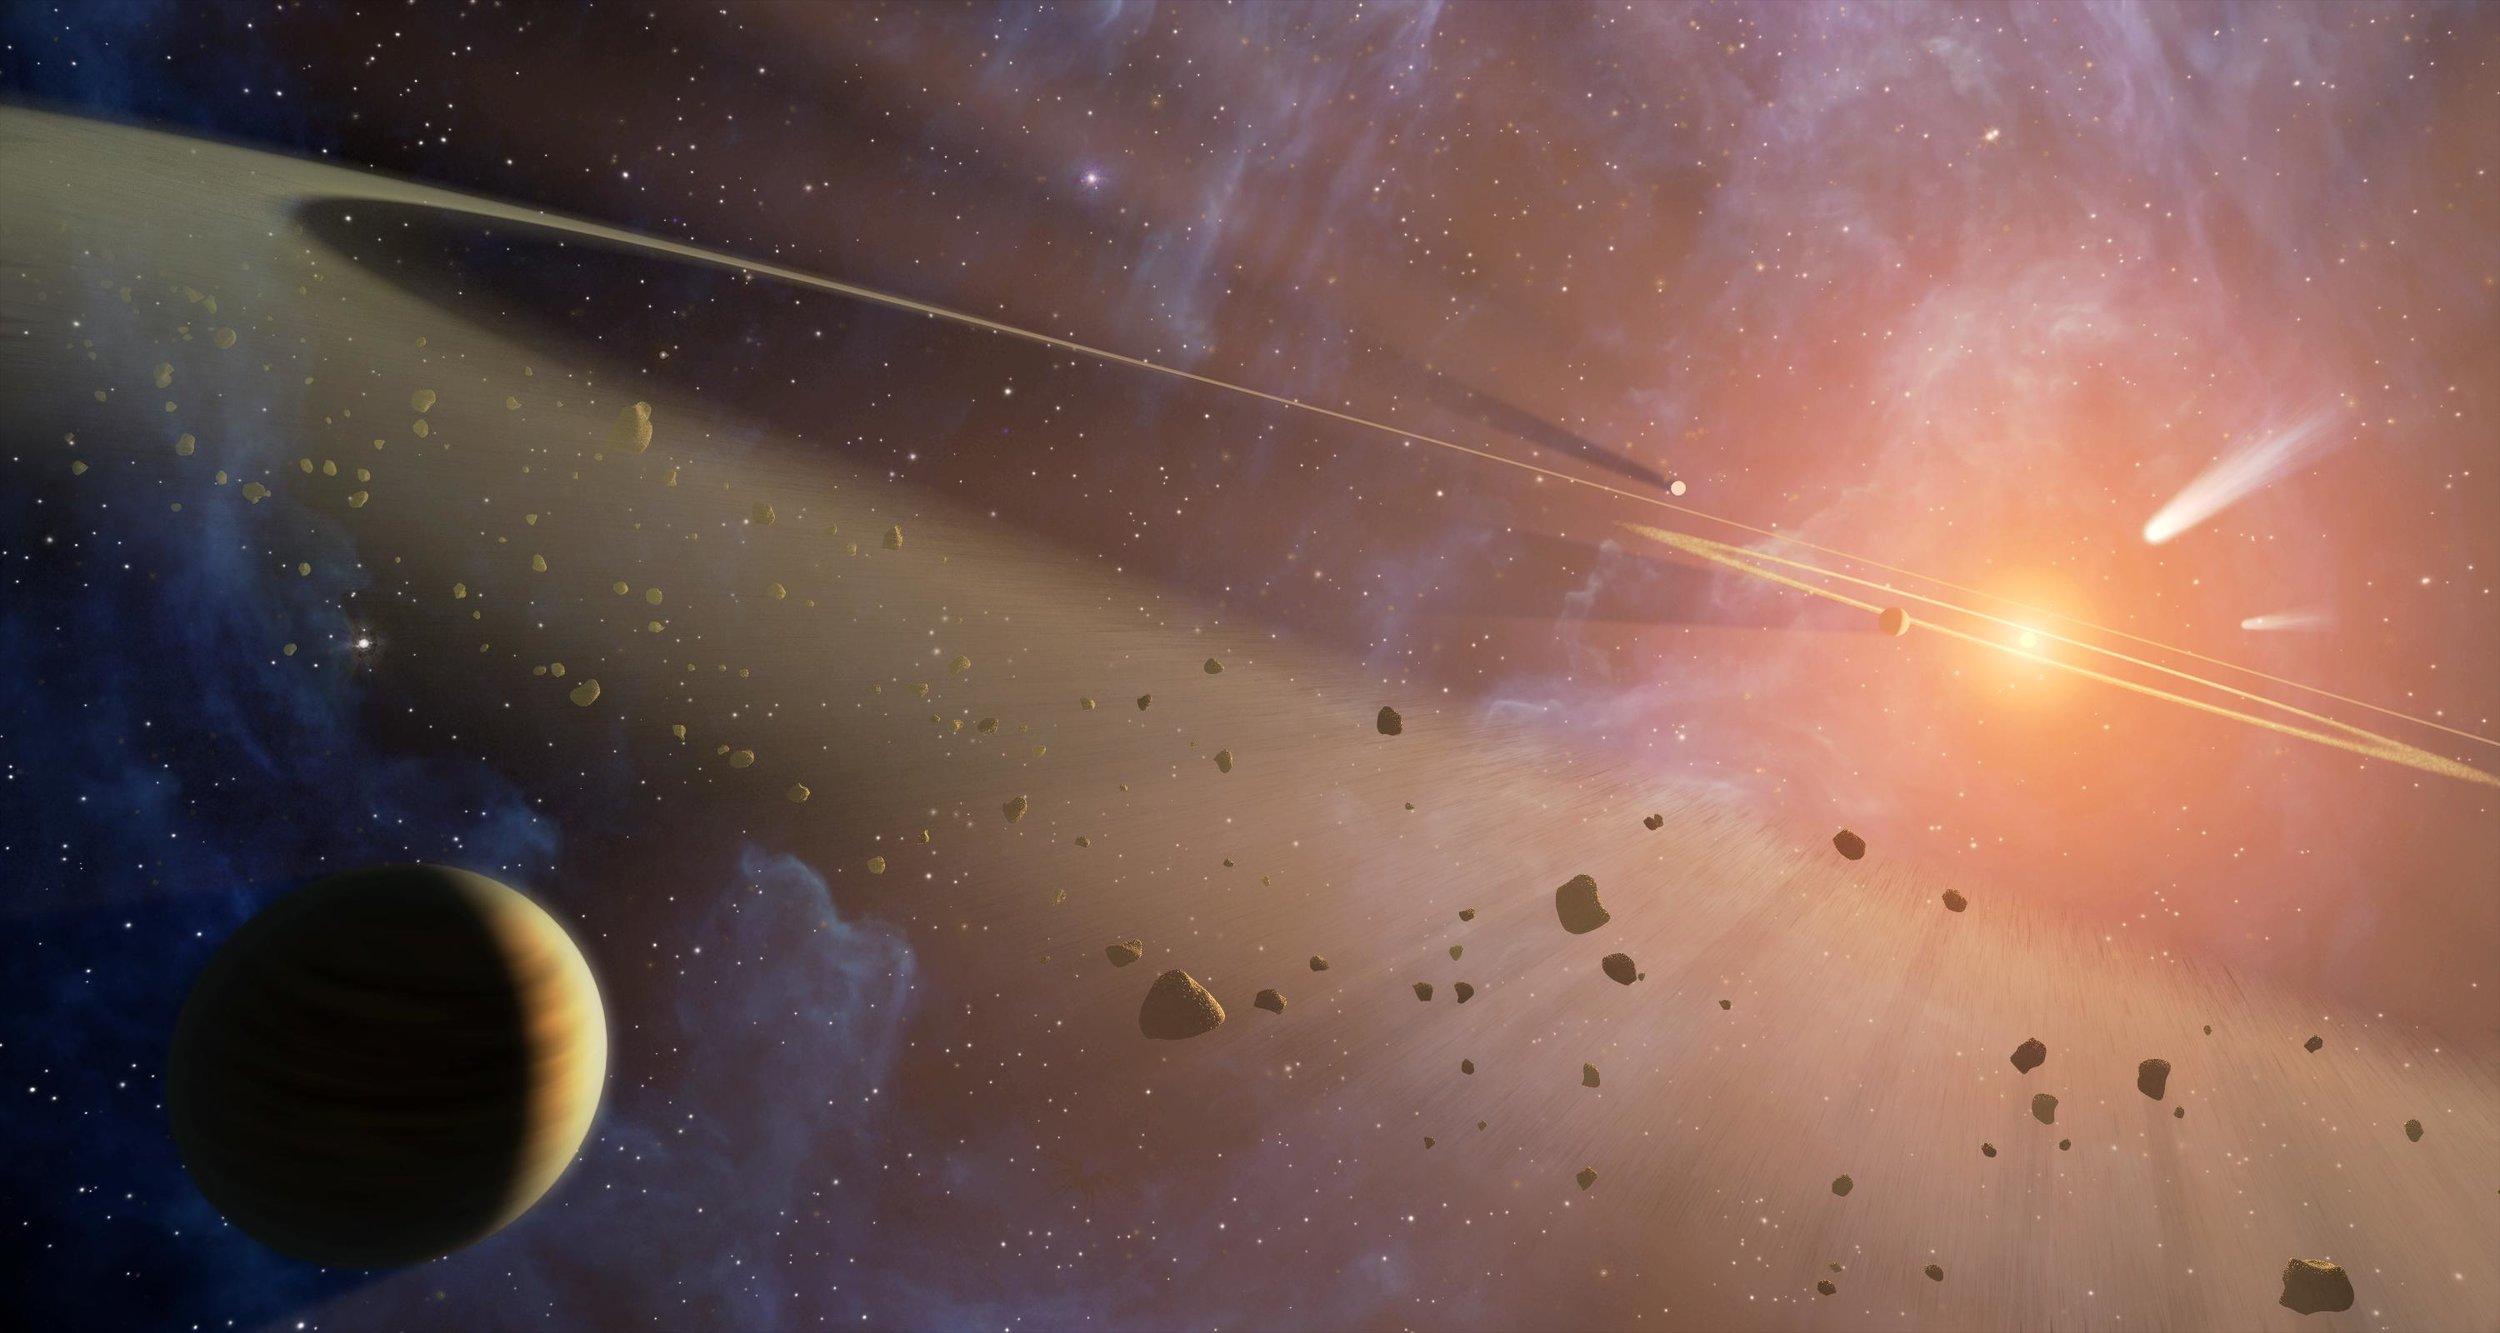 Double the Rubble (Artist Concept) - Image Credit: NASA/JPL-Caltech